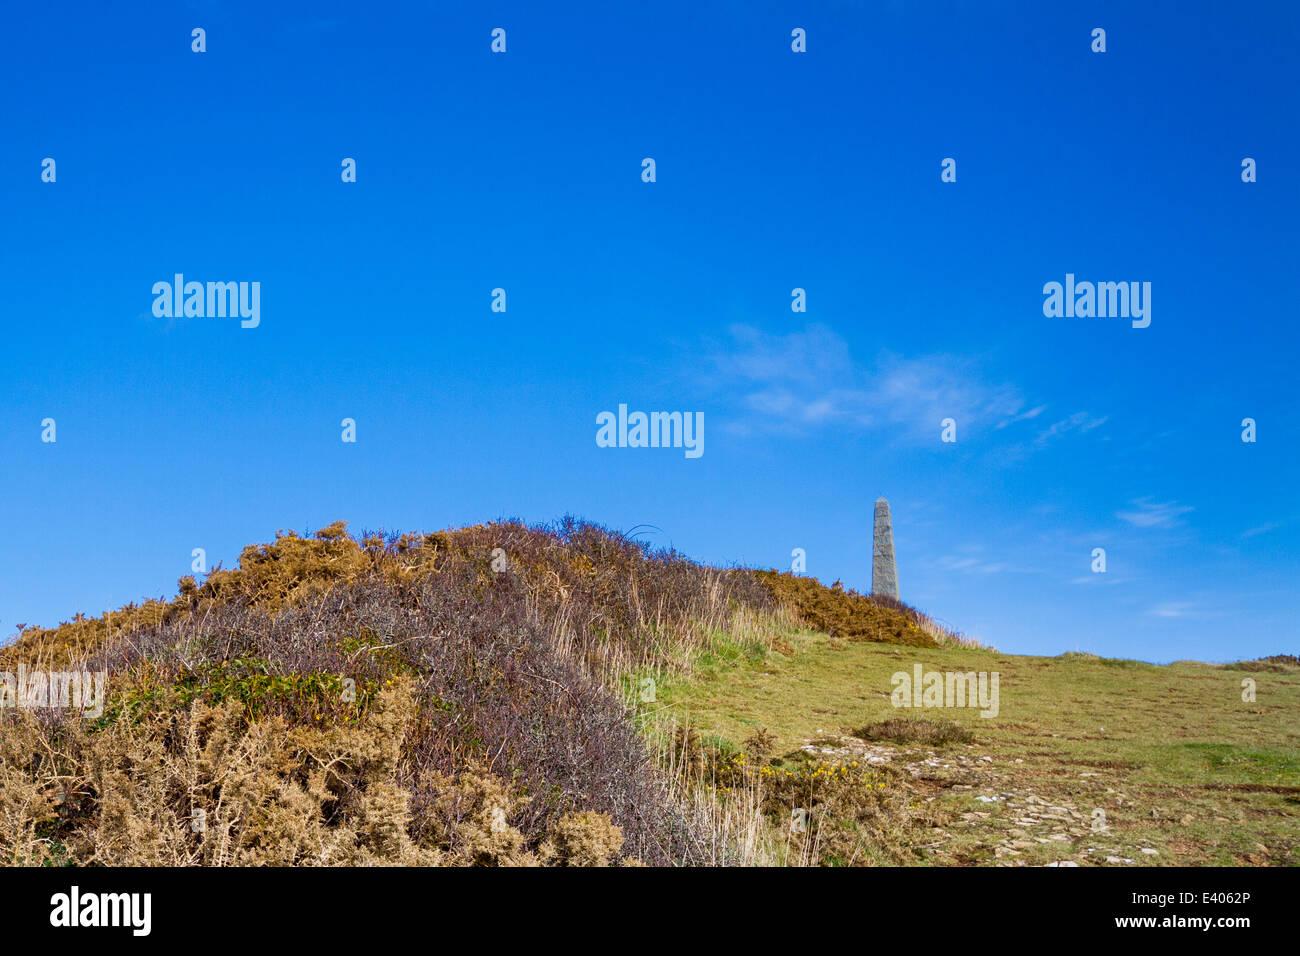 Coastal scene on the Channel Islands - Stock Image